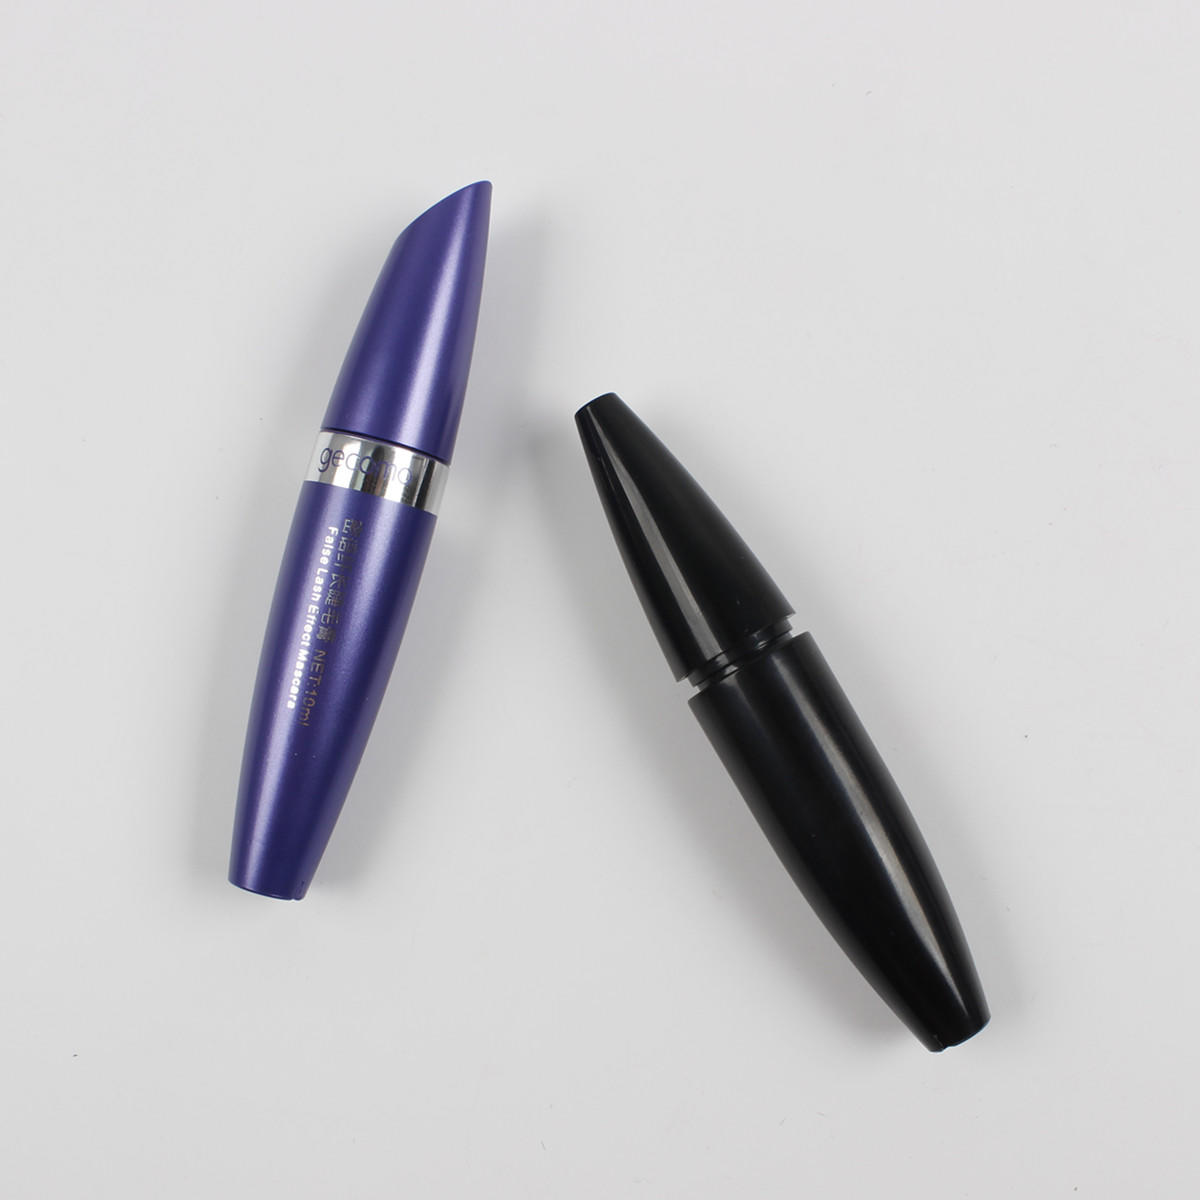 5ml mascara wand tubes and lip gloss tube square empty mascara tubes with brush